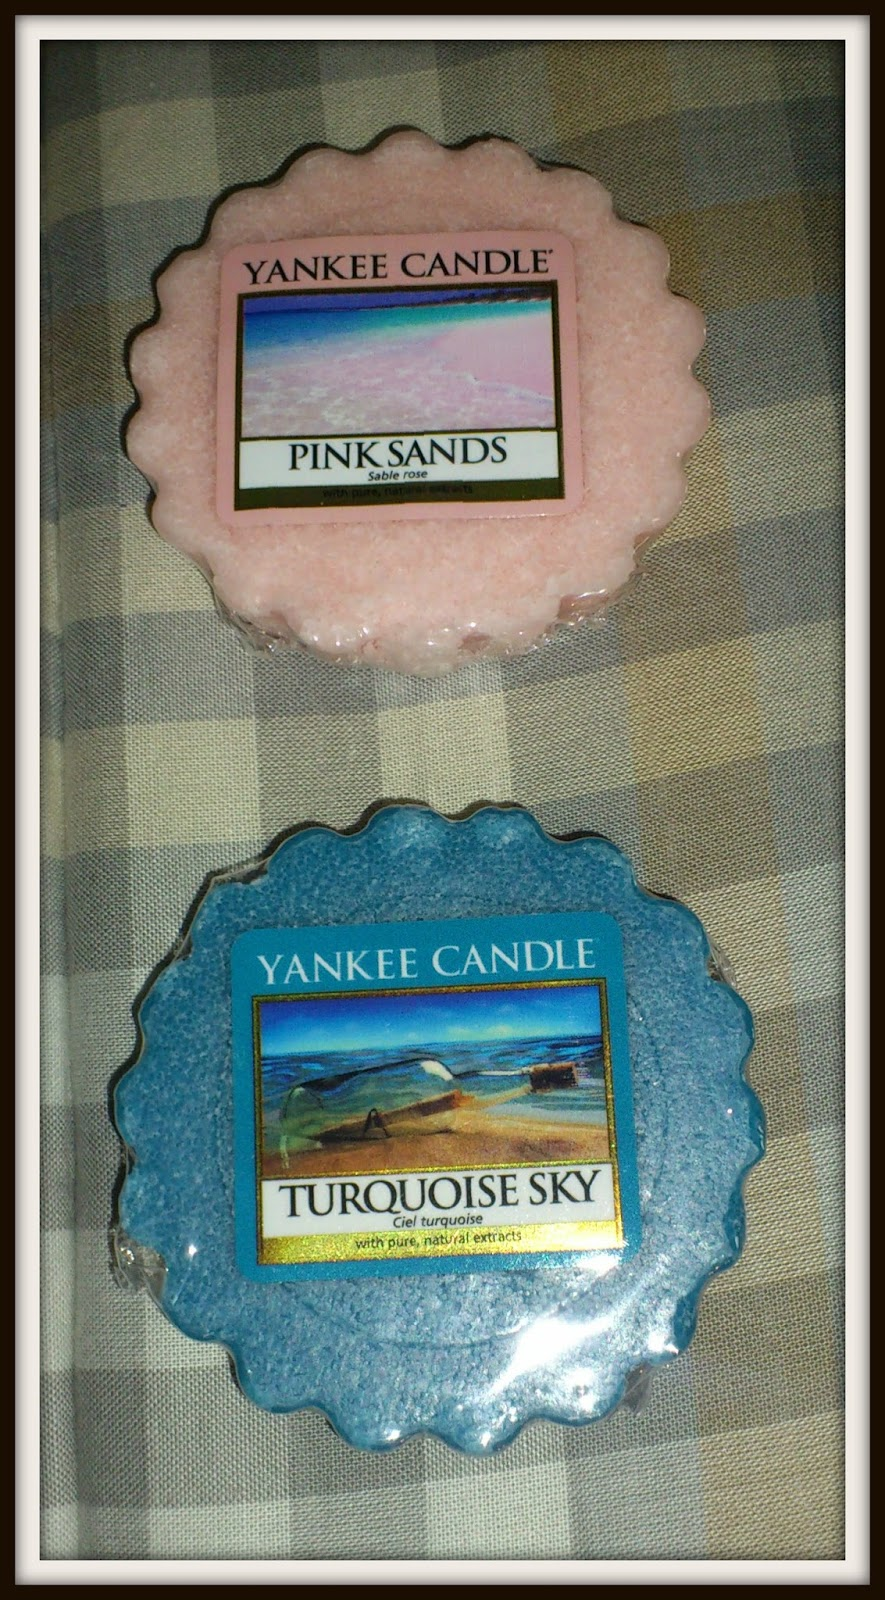 Il magico mondo di cinnamon candele yankee candle for Mobili yankee candle